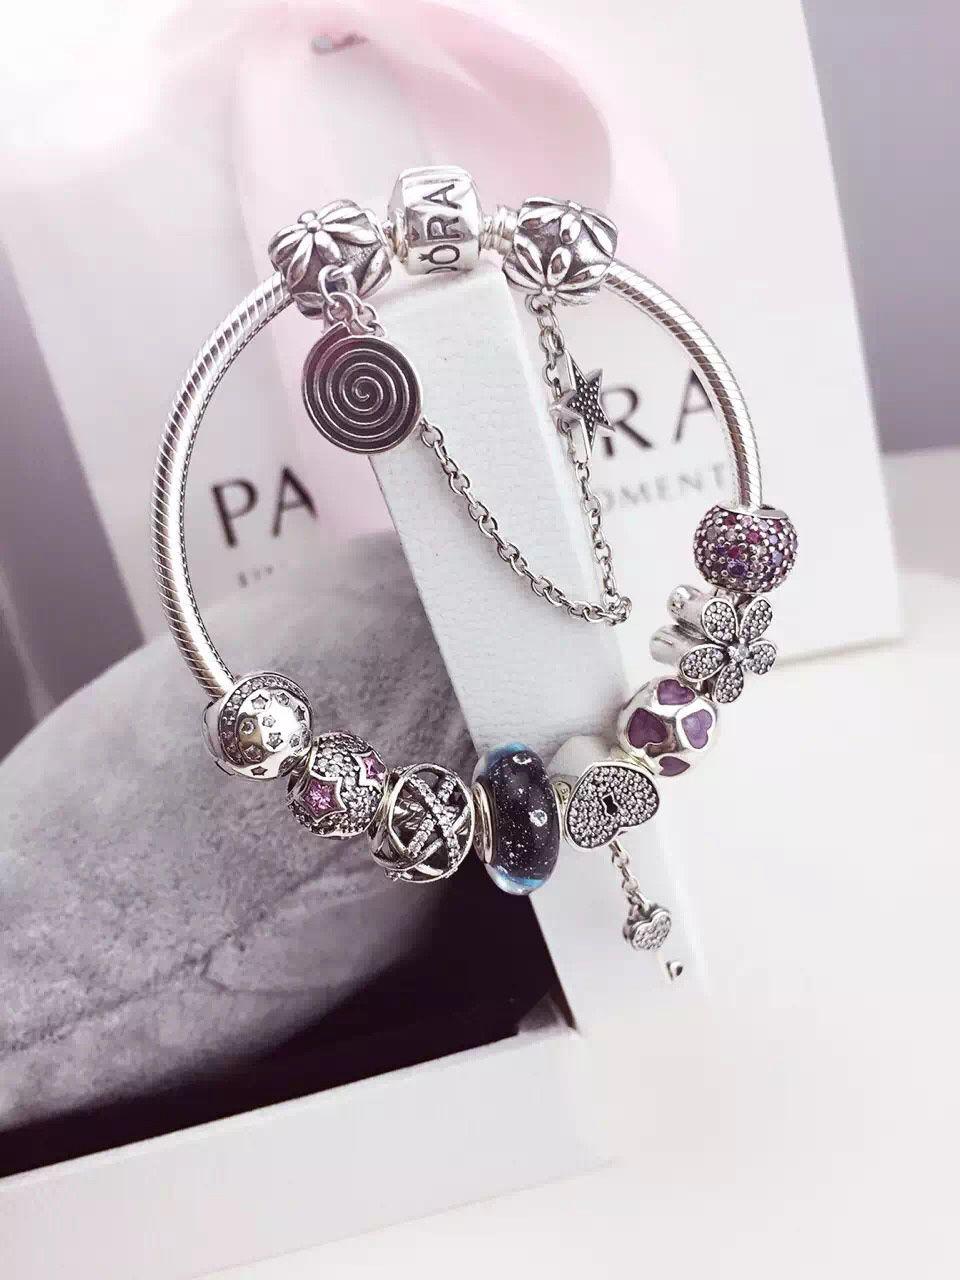 50 Off 239 Pandora Charm Bracelet Purple Blue Hot